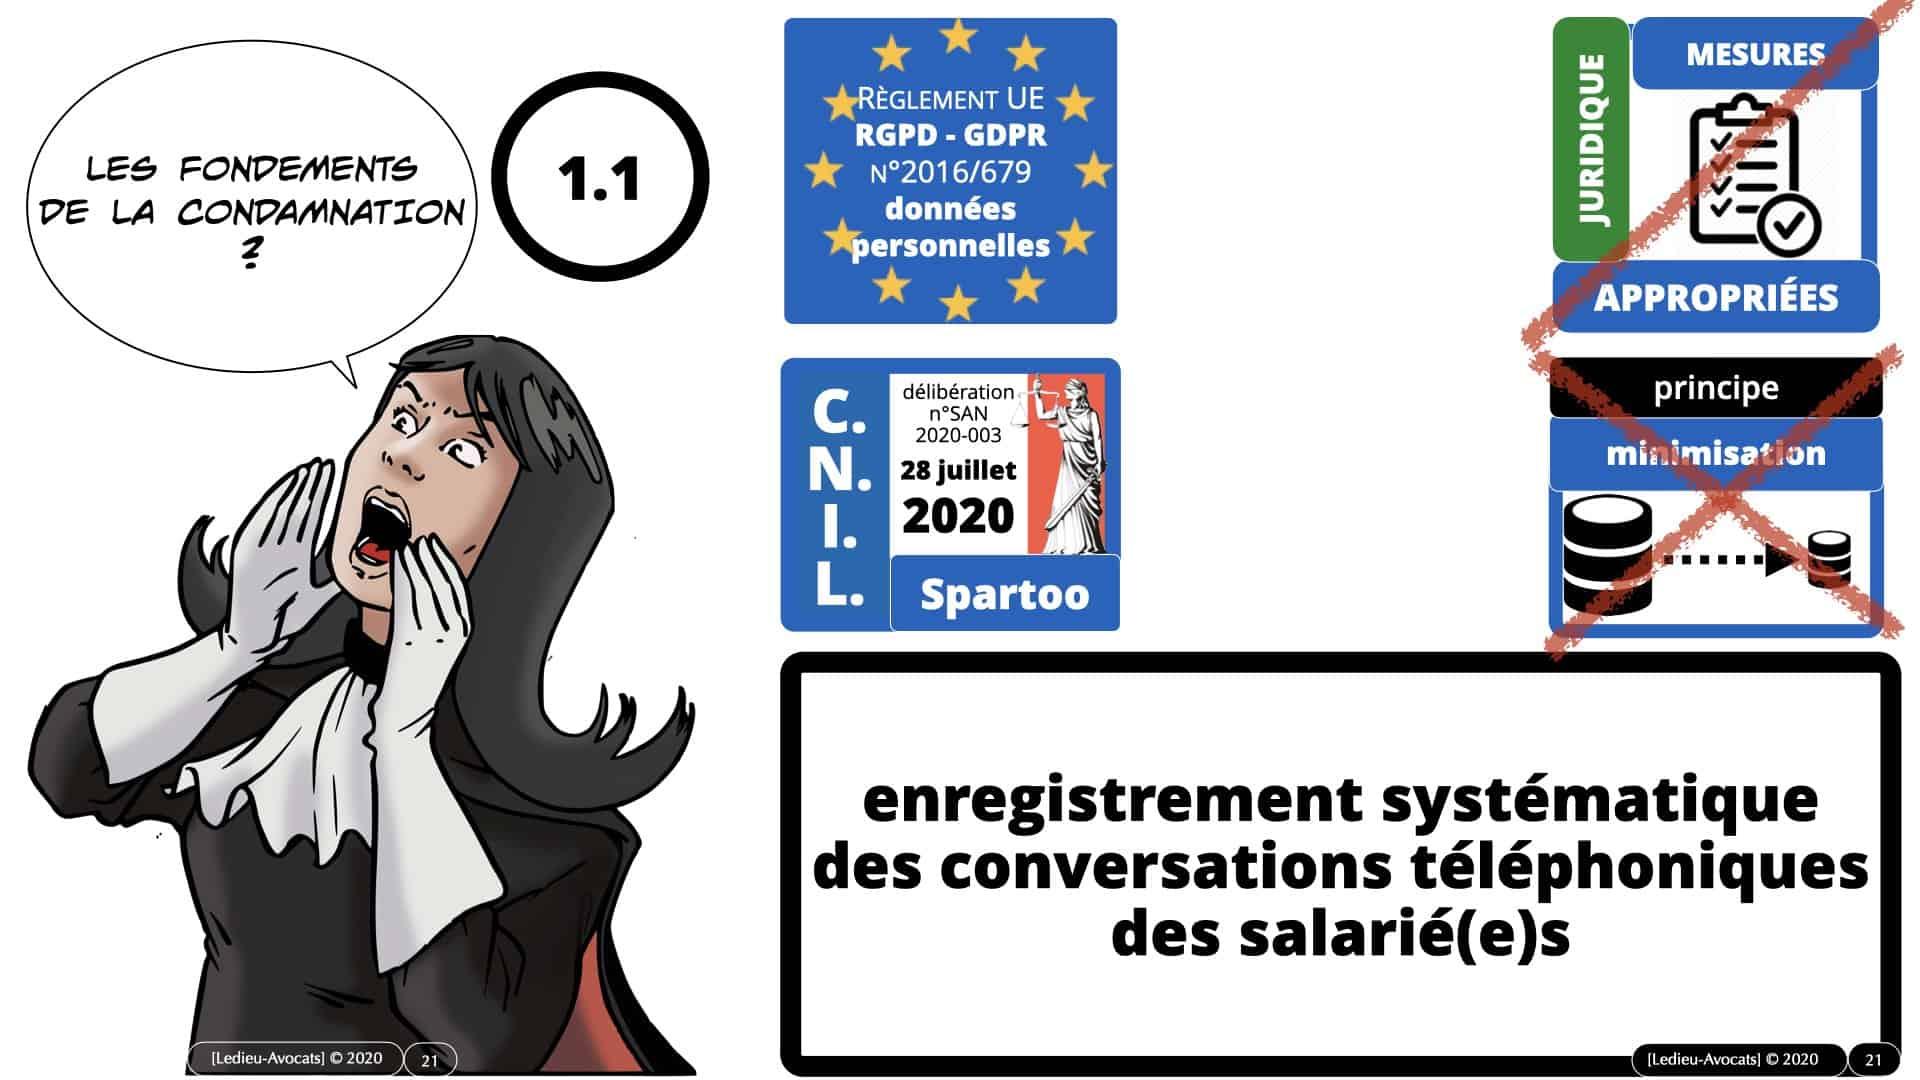 RGPD délibération CNIL Spartoo du 28 juillet 2020 n°SAN 2020-003 MOTIF 01